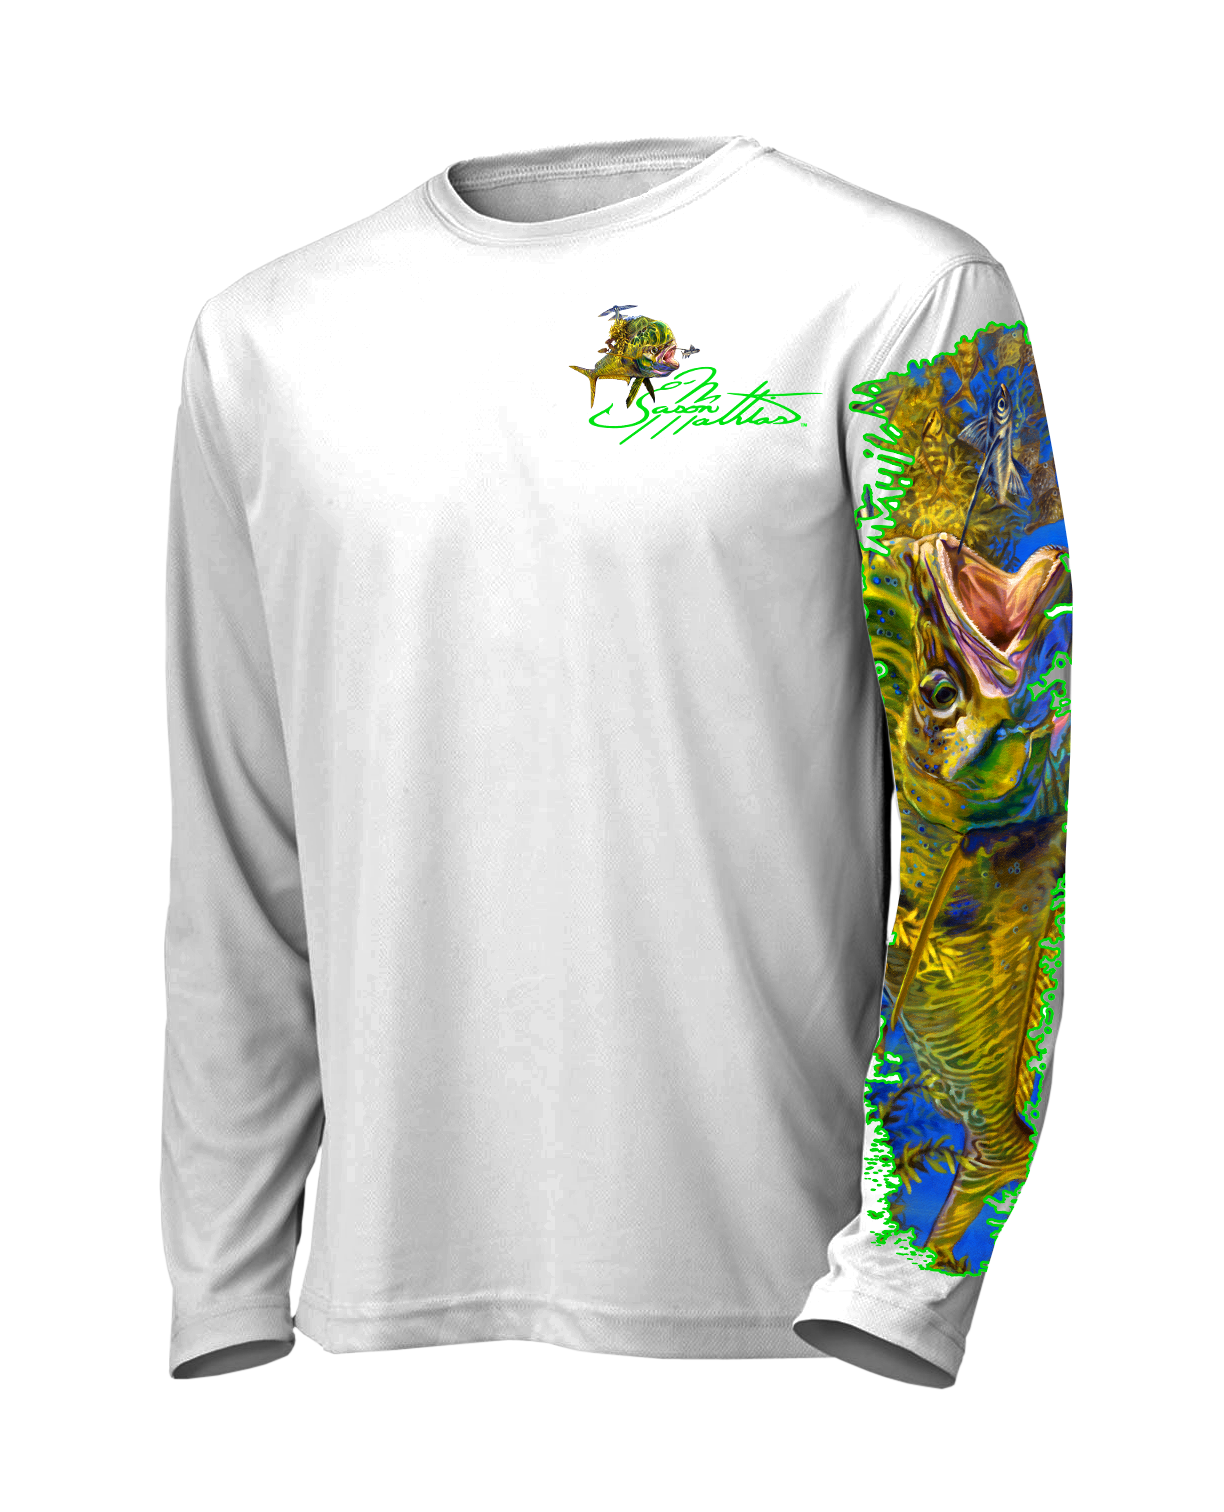 jason-mathias-shirt-line-front-mahi-dorado-dolphin-art-offshore-performance-clothing-gear.png